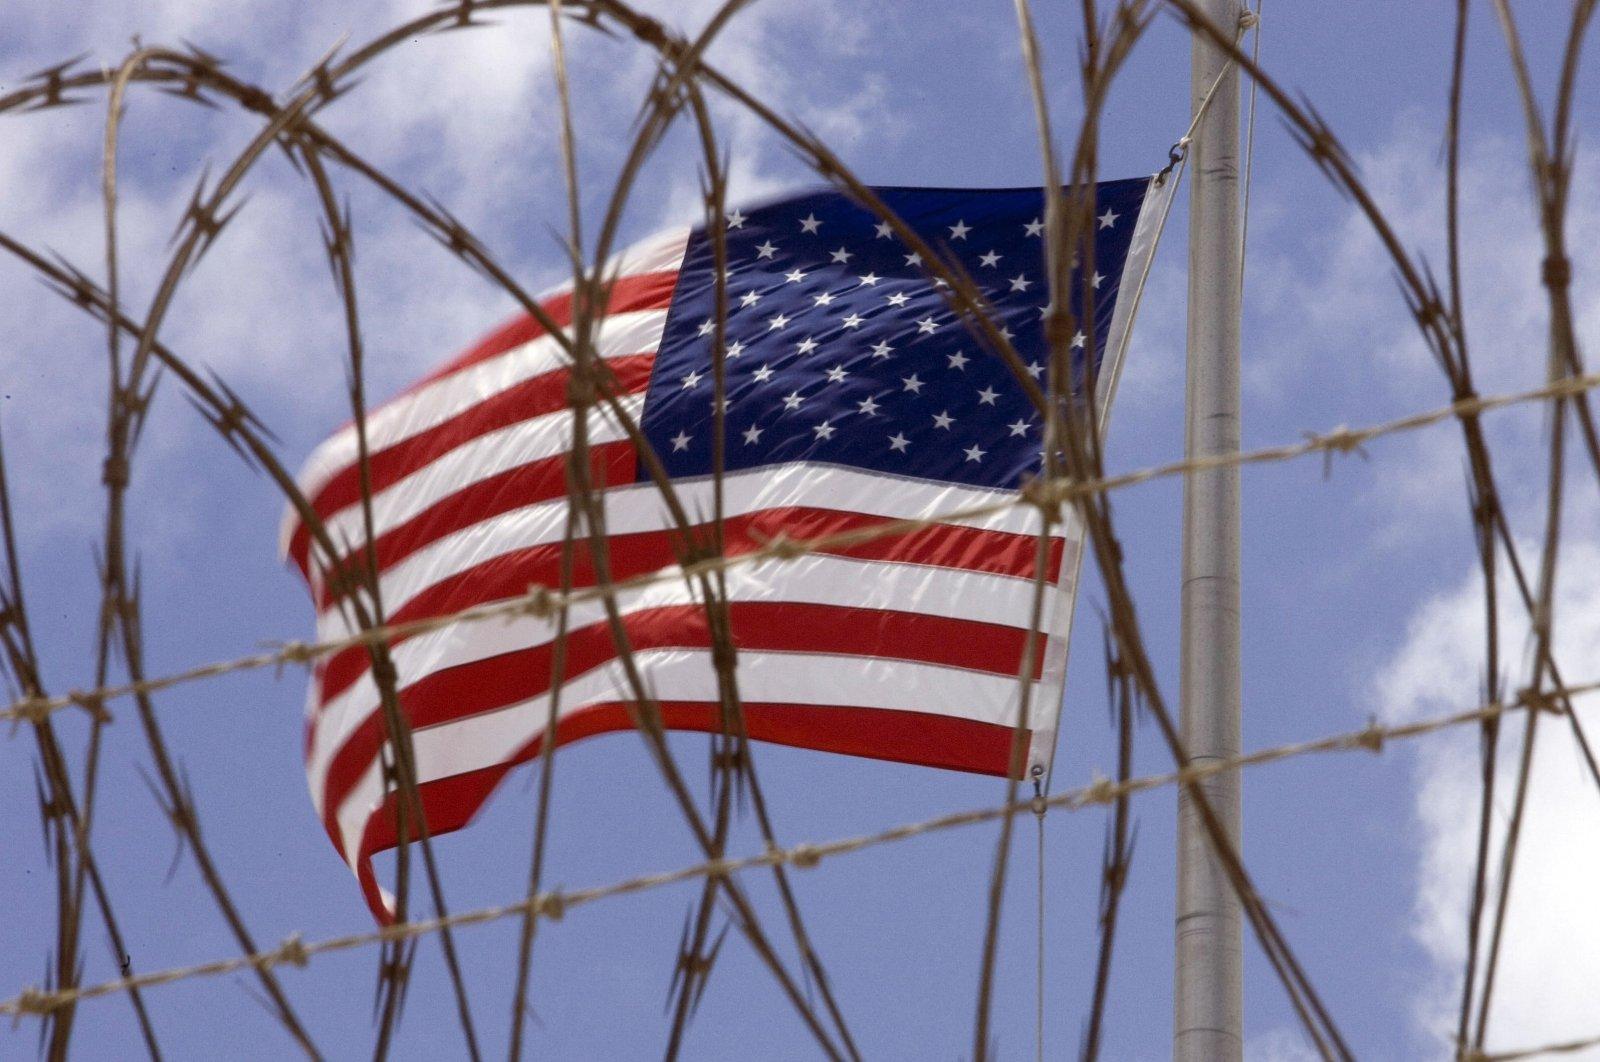 A U.S. flag flies at Camp V inside Camp Delta at the U.S. Naval Station in Guantanamo Bay, Cuba, April 24, 2007. (AFP File Photo)